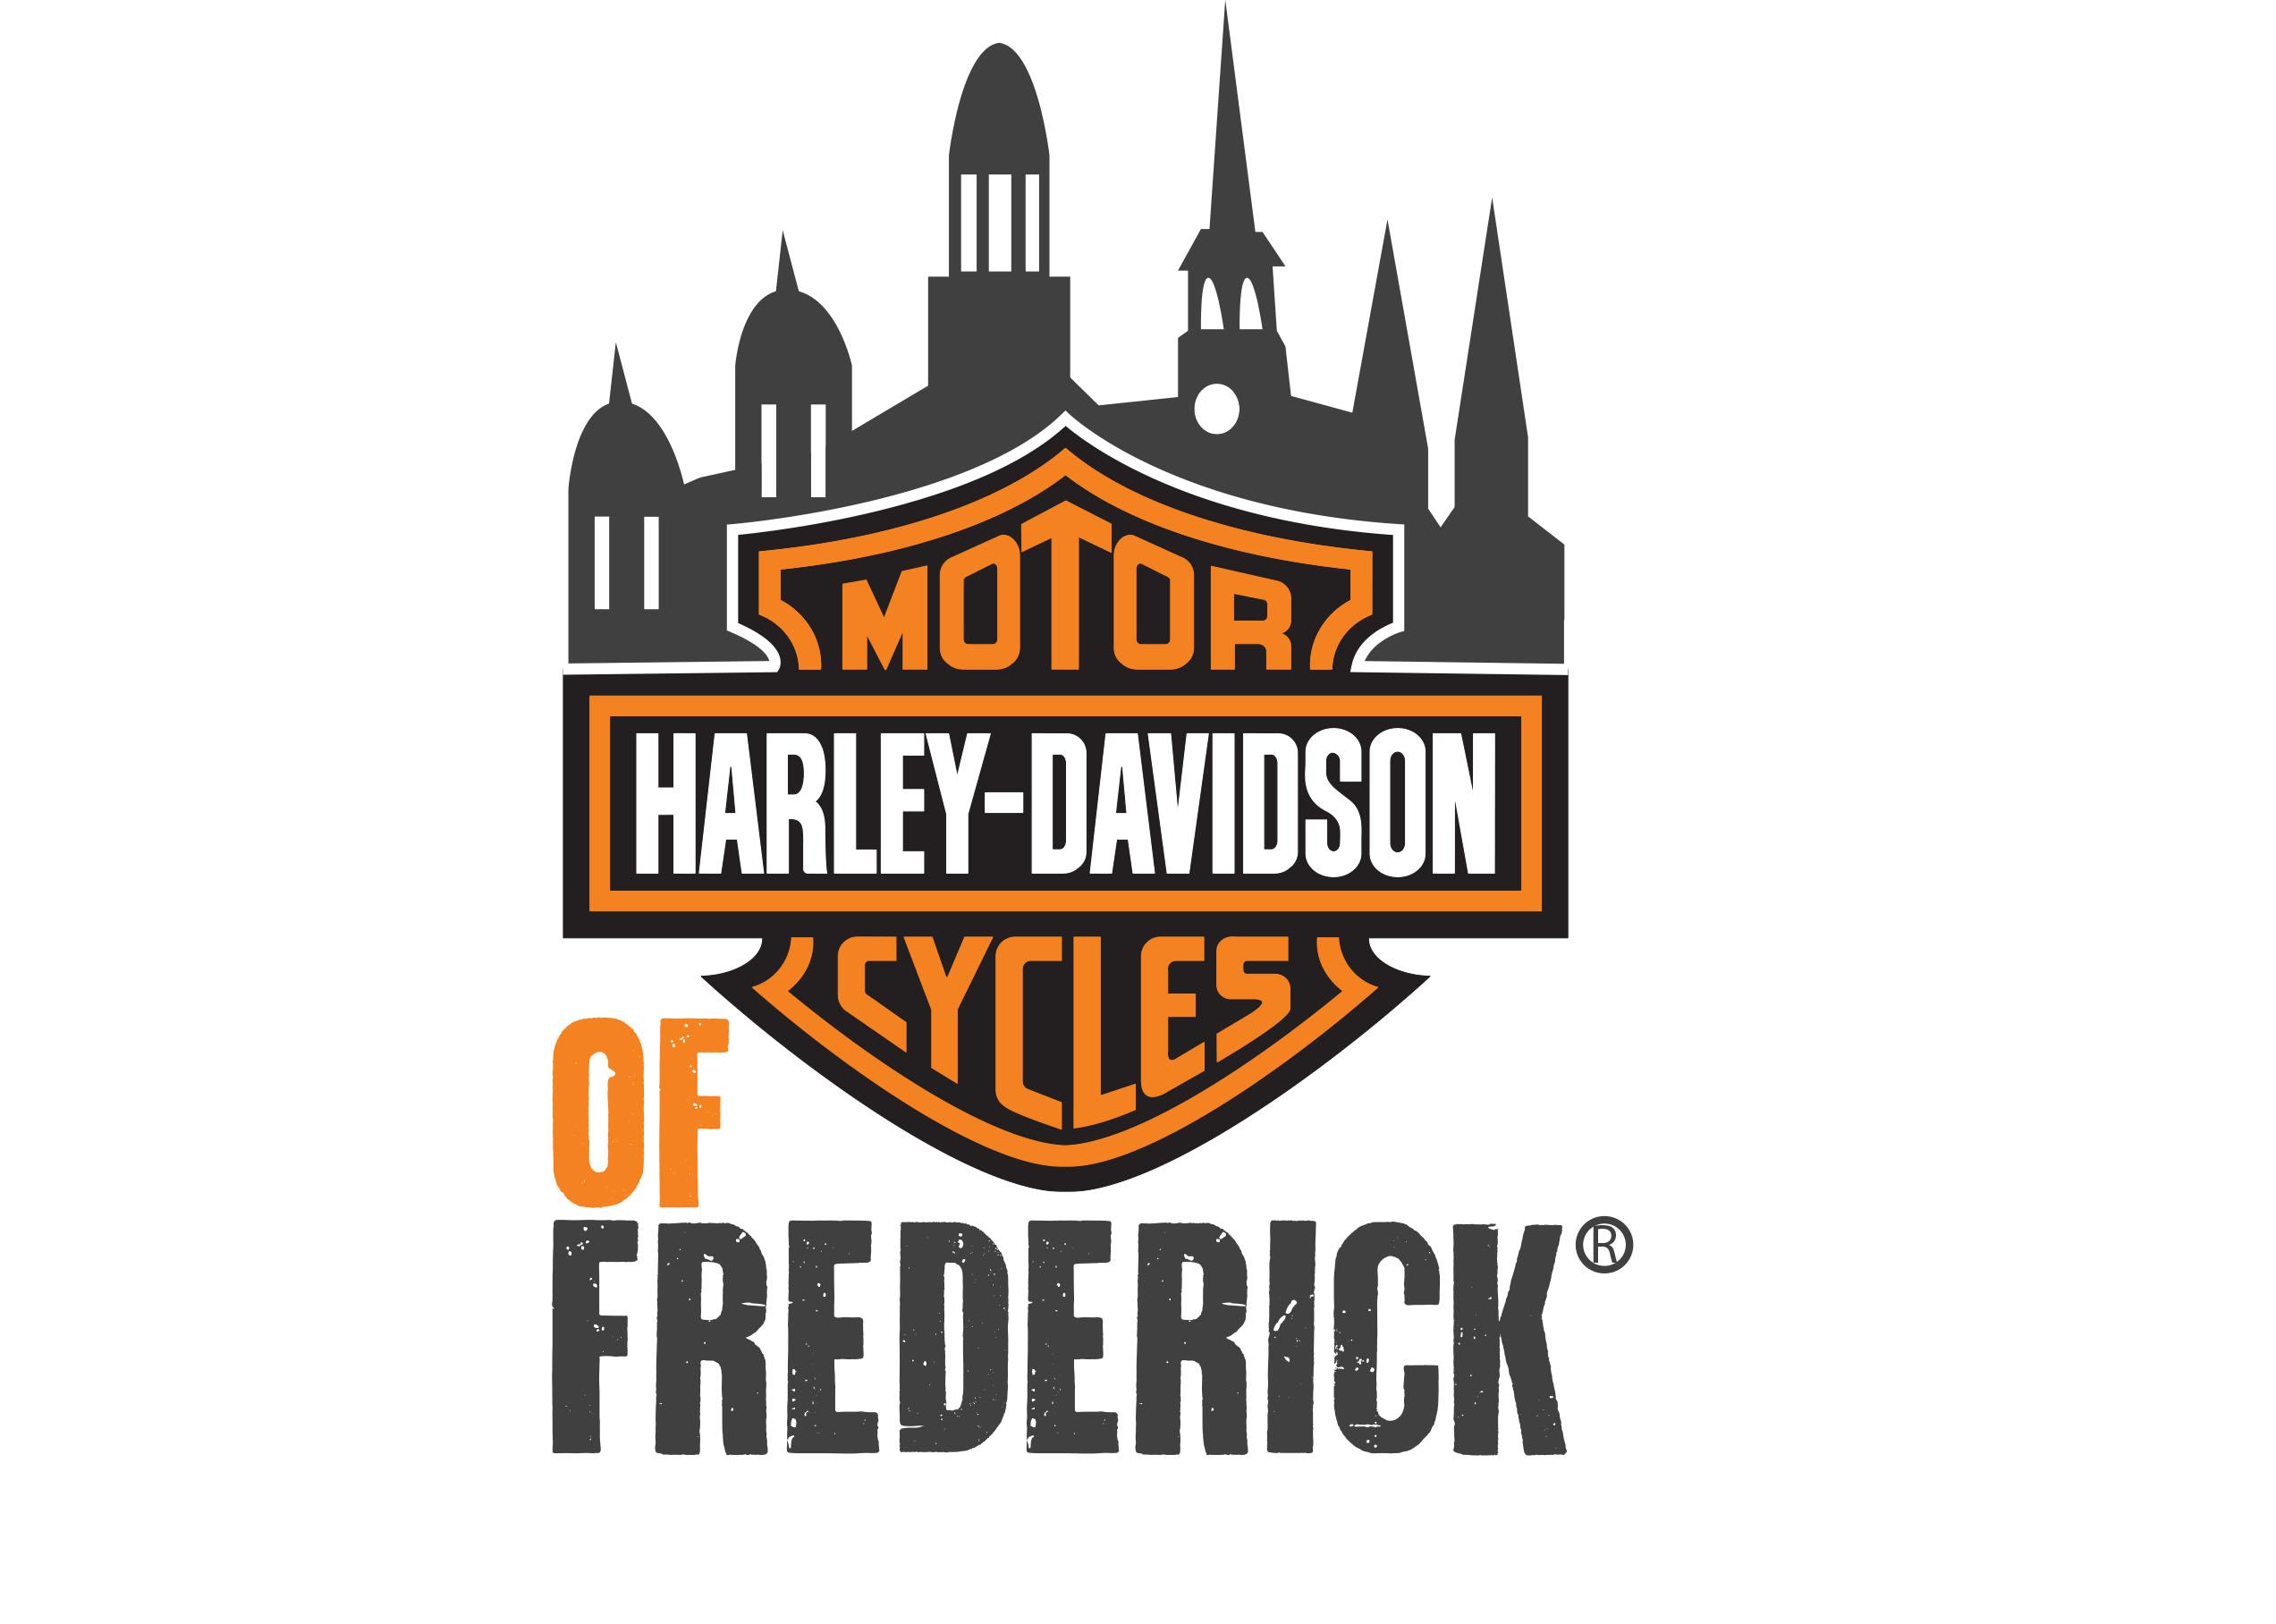 HARLEY-DAVIDSON OF FREDERICK, INC.